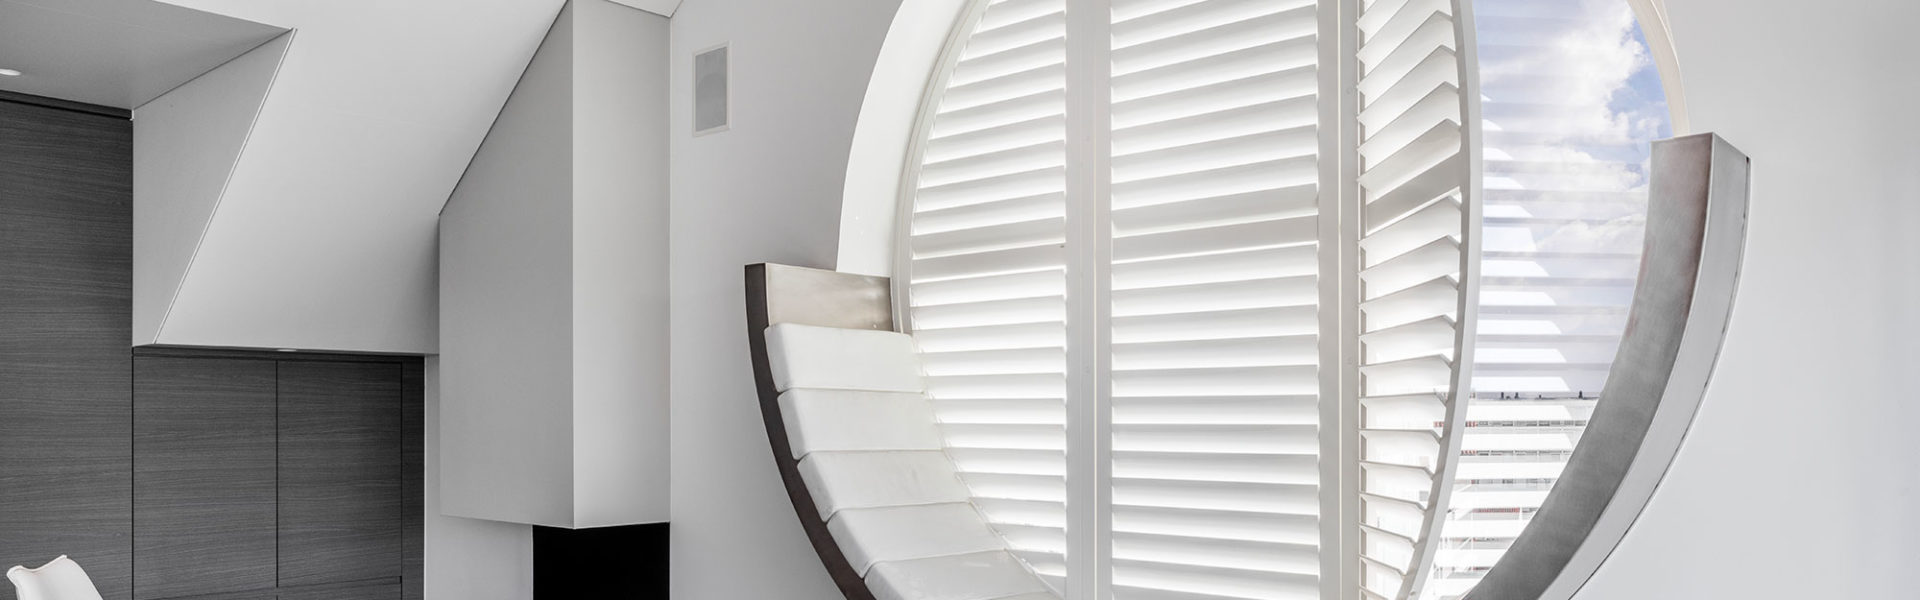 Shutters-special-shaped-window-(2)